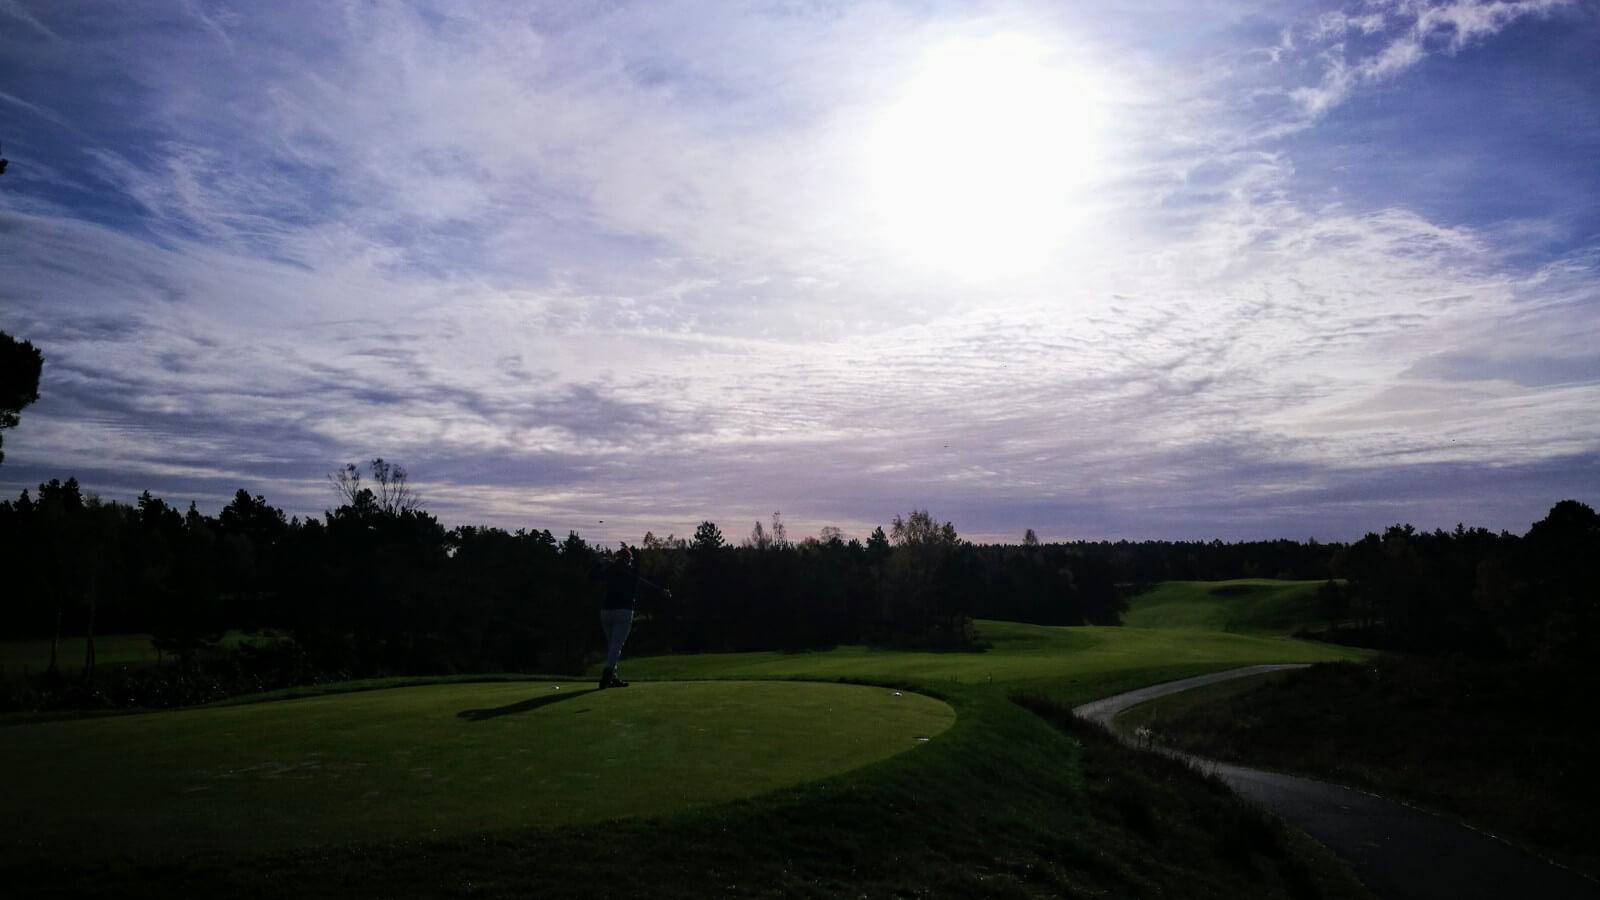 Hull 1, Kragerø Golfklubb